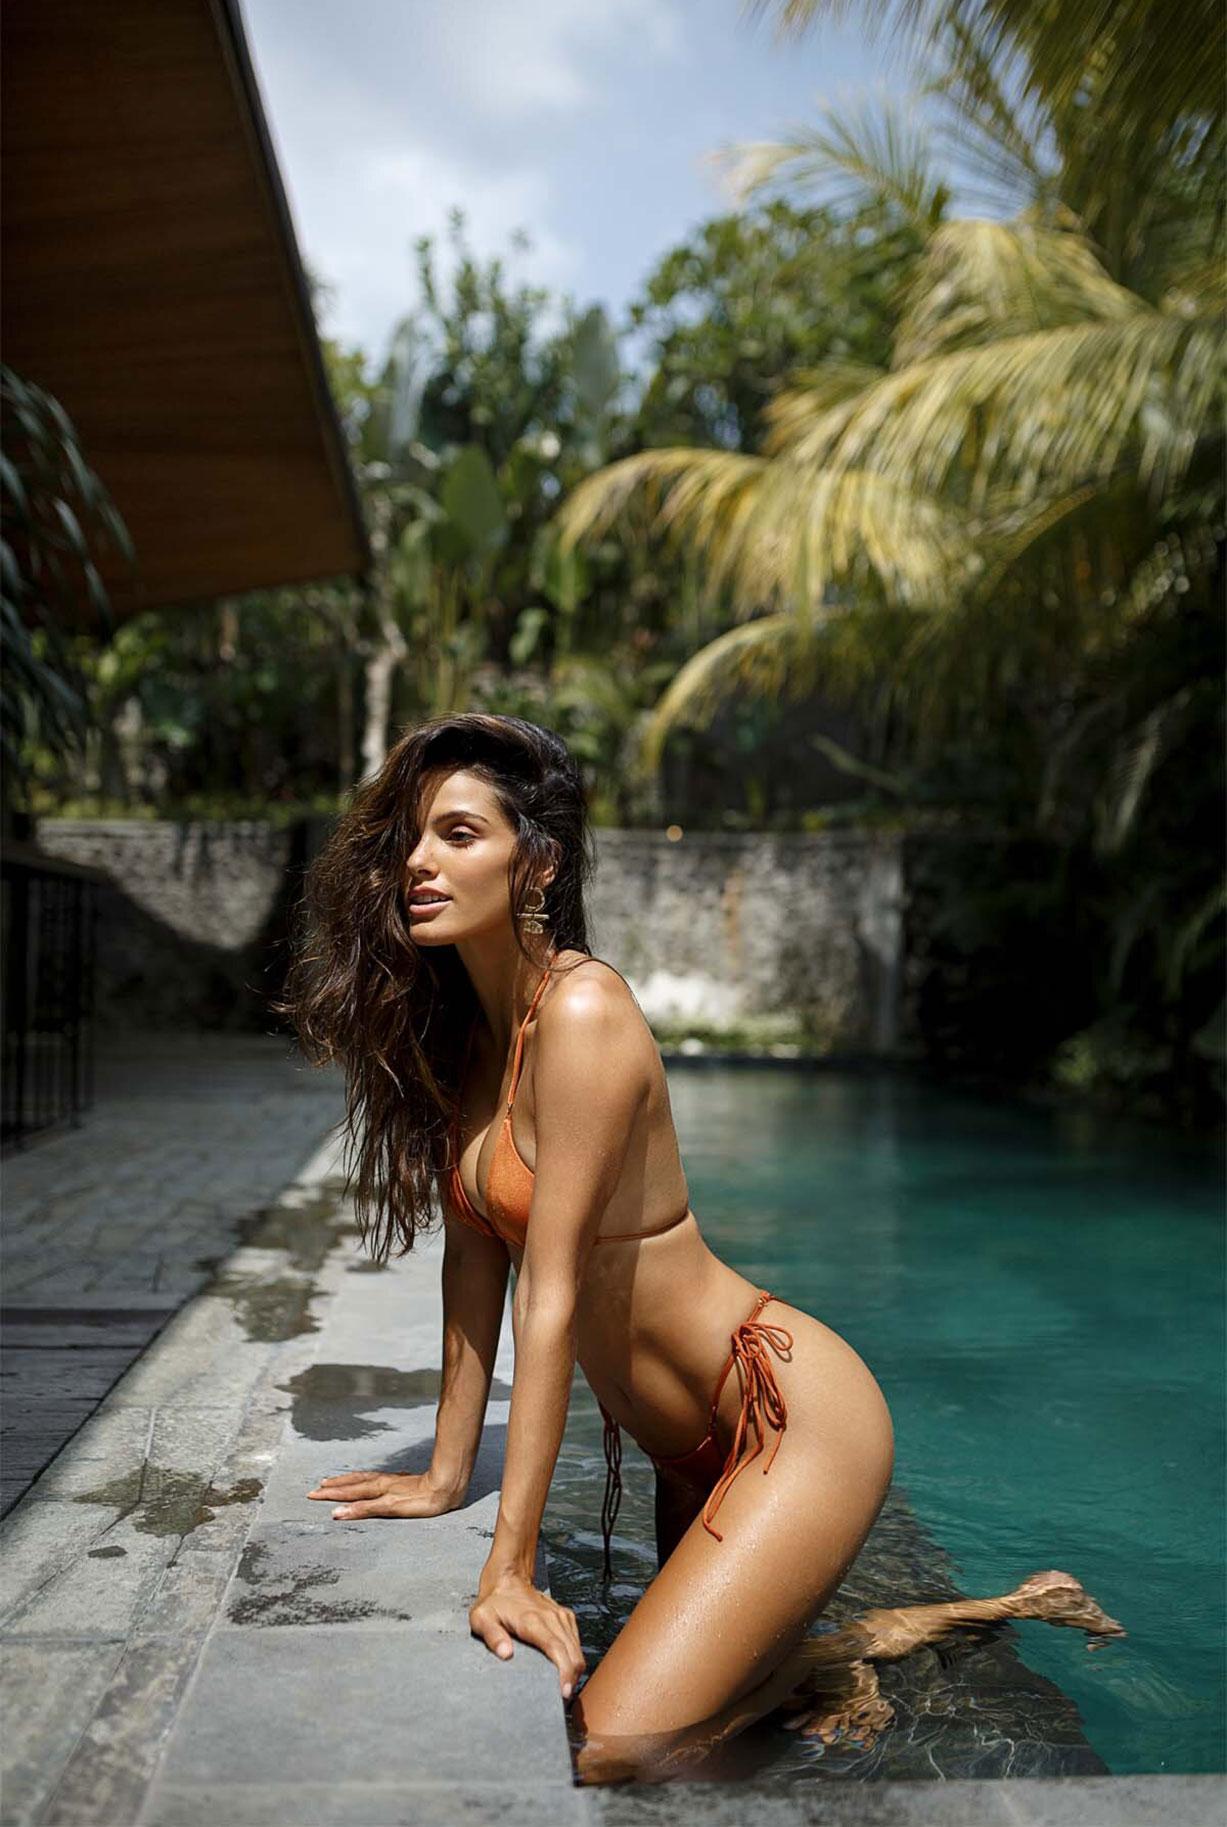 Найара Лима отдыхает у бассейна на Бали / фото 05